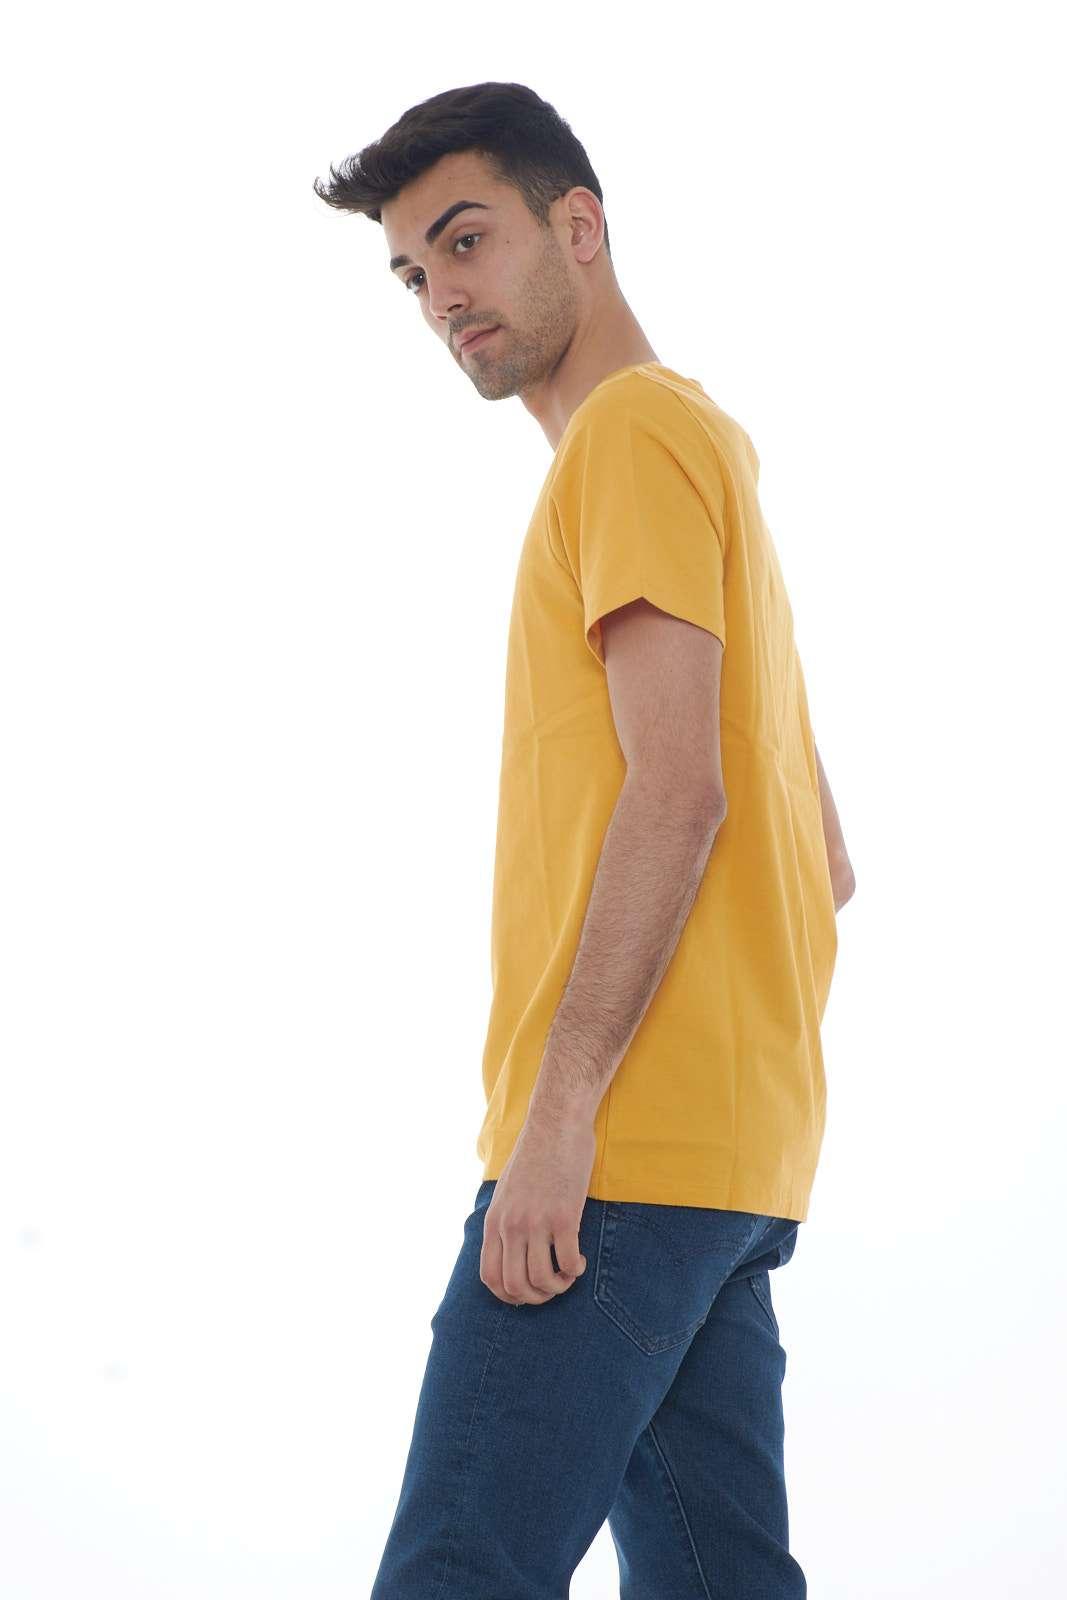 https://www.parmax.com/media/catalog/product/a/i/PE-outlet_parmax-t-shirt-uomo-Levis-171640003-B.jpg